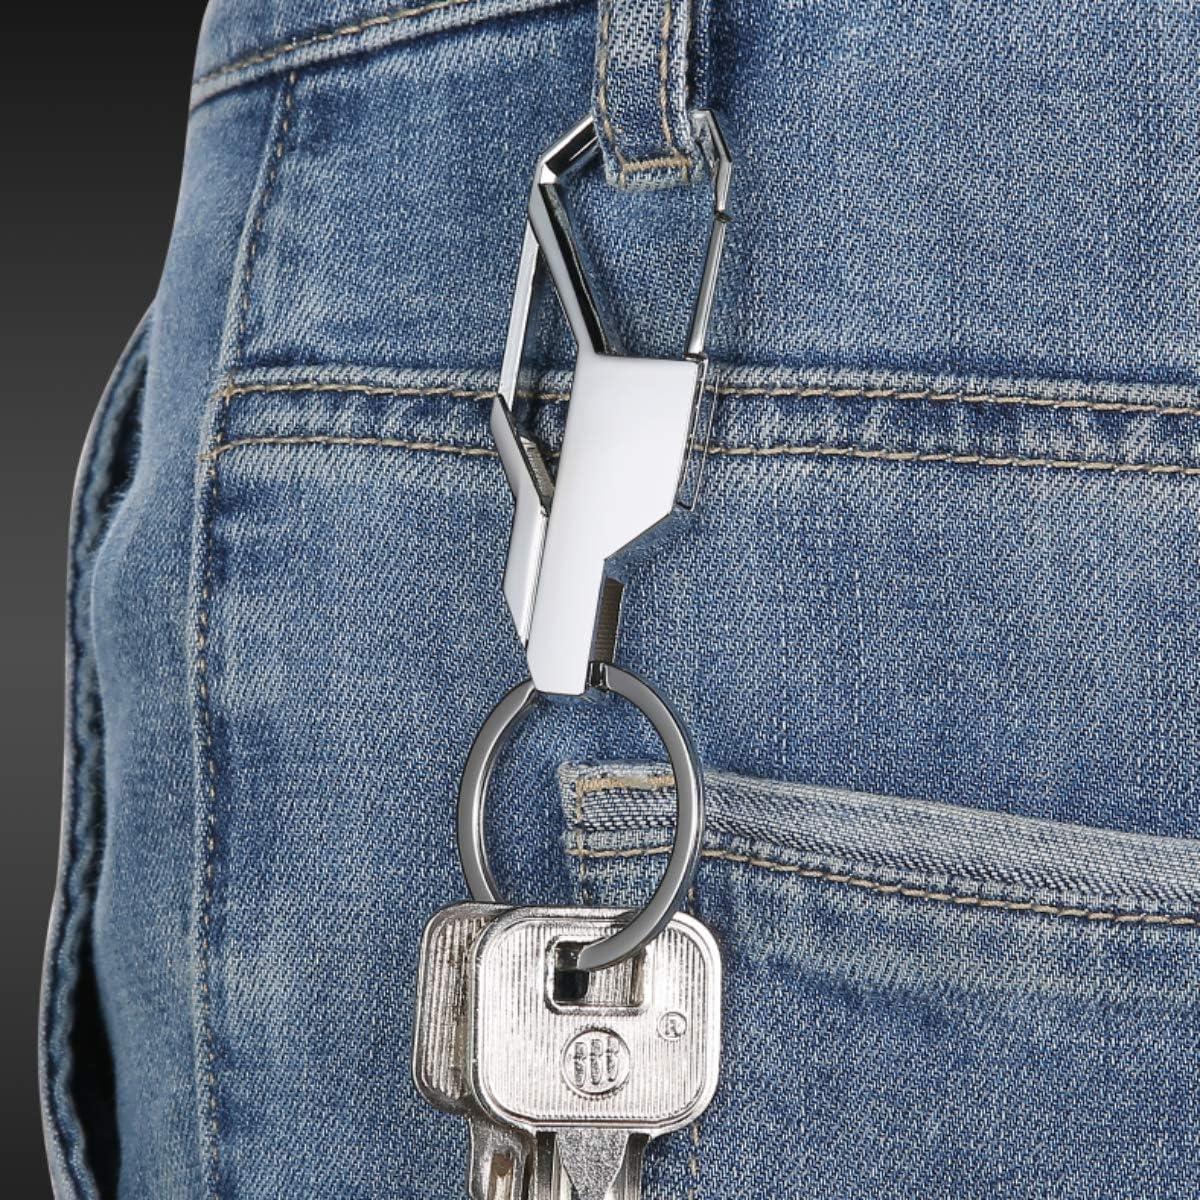 Black and silver ILANKTOZI 2 PCS Zinc Alloy Key chains Creative metal keychain Heavy Duty Car Keychain for Men and Women